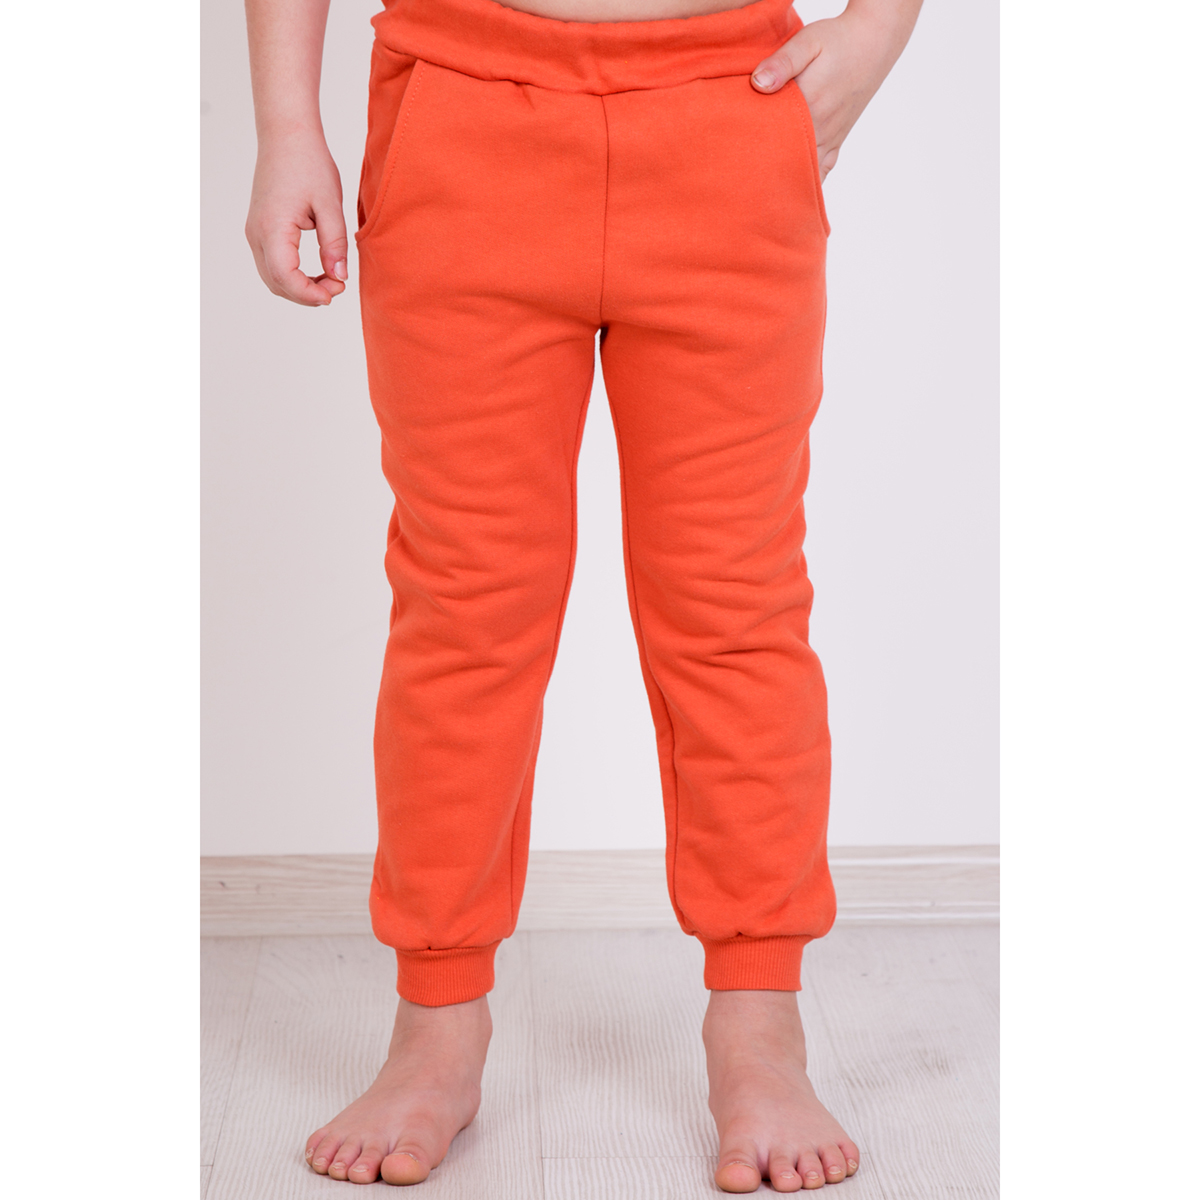 Детские брюки Саша, размер 3 годаБрюки<br><br><br>Тип: Дет. брюки<br>Размер: 3 года<br>Материал: Футер